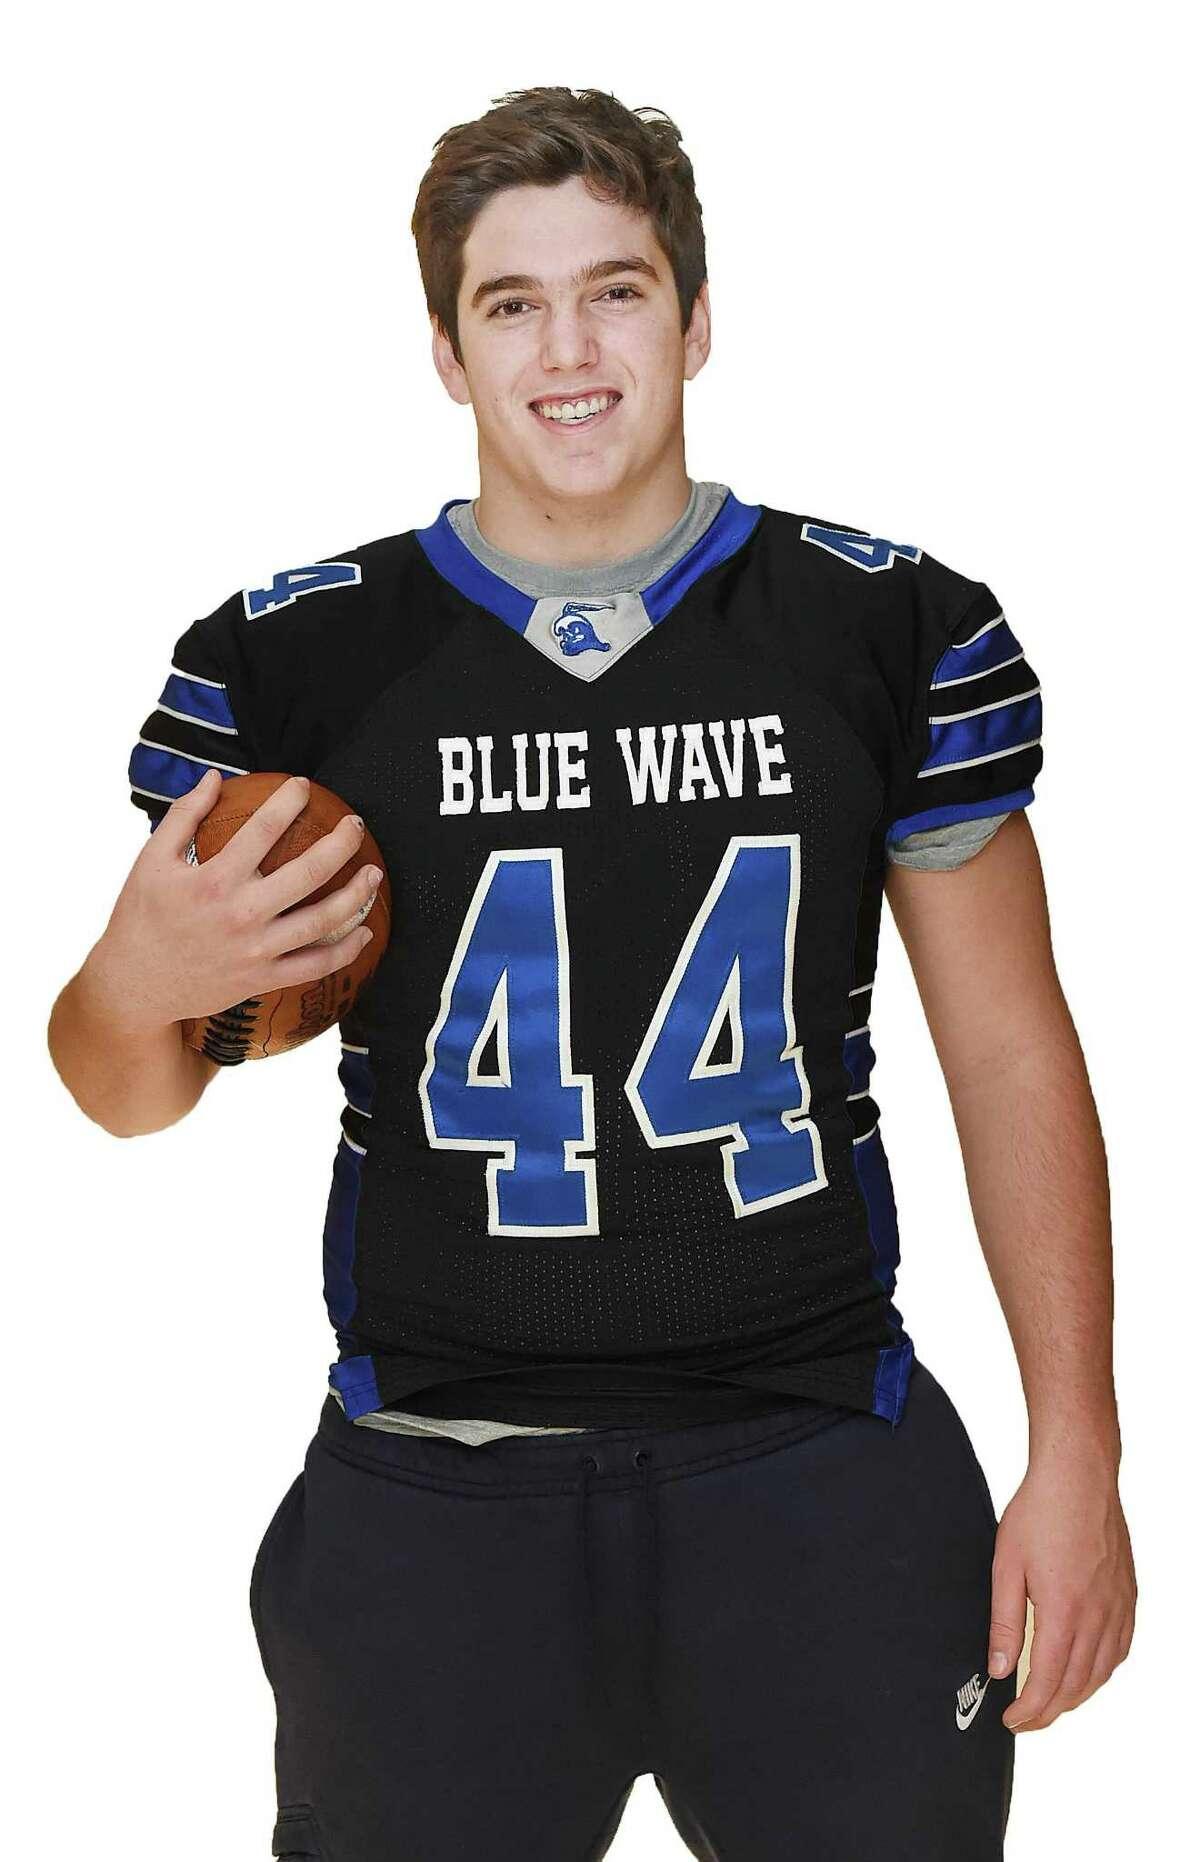 Connor Fay Darien High School All - State Football Tuesday, Dec. 20, 2017